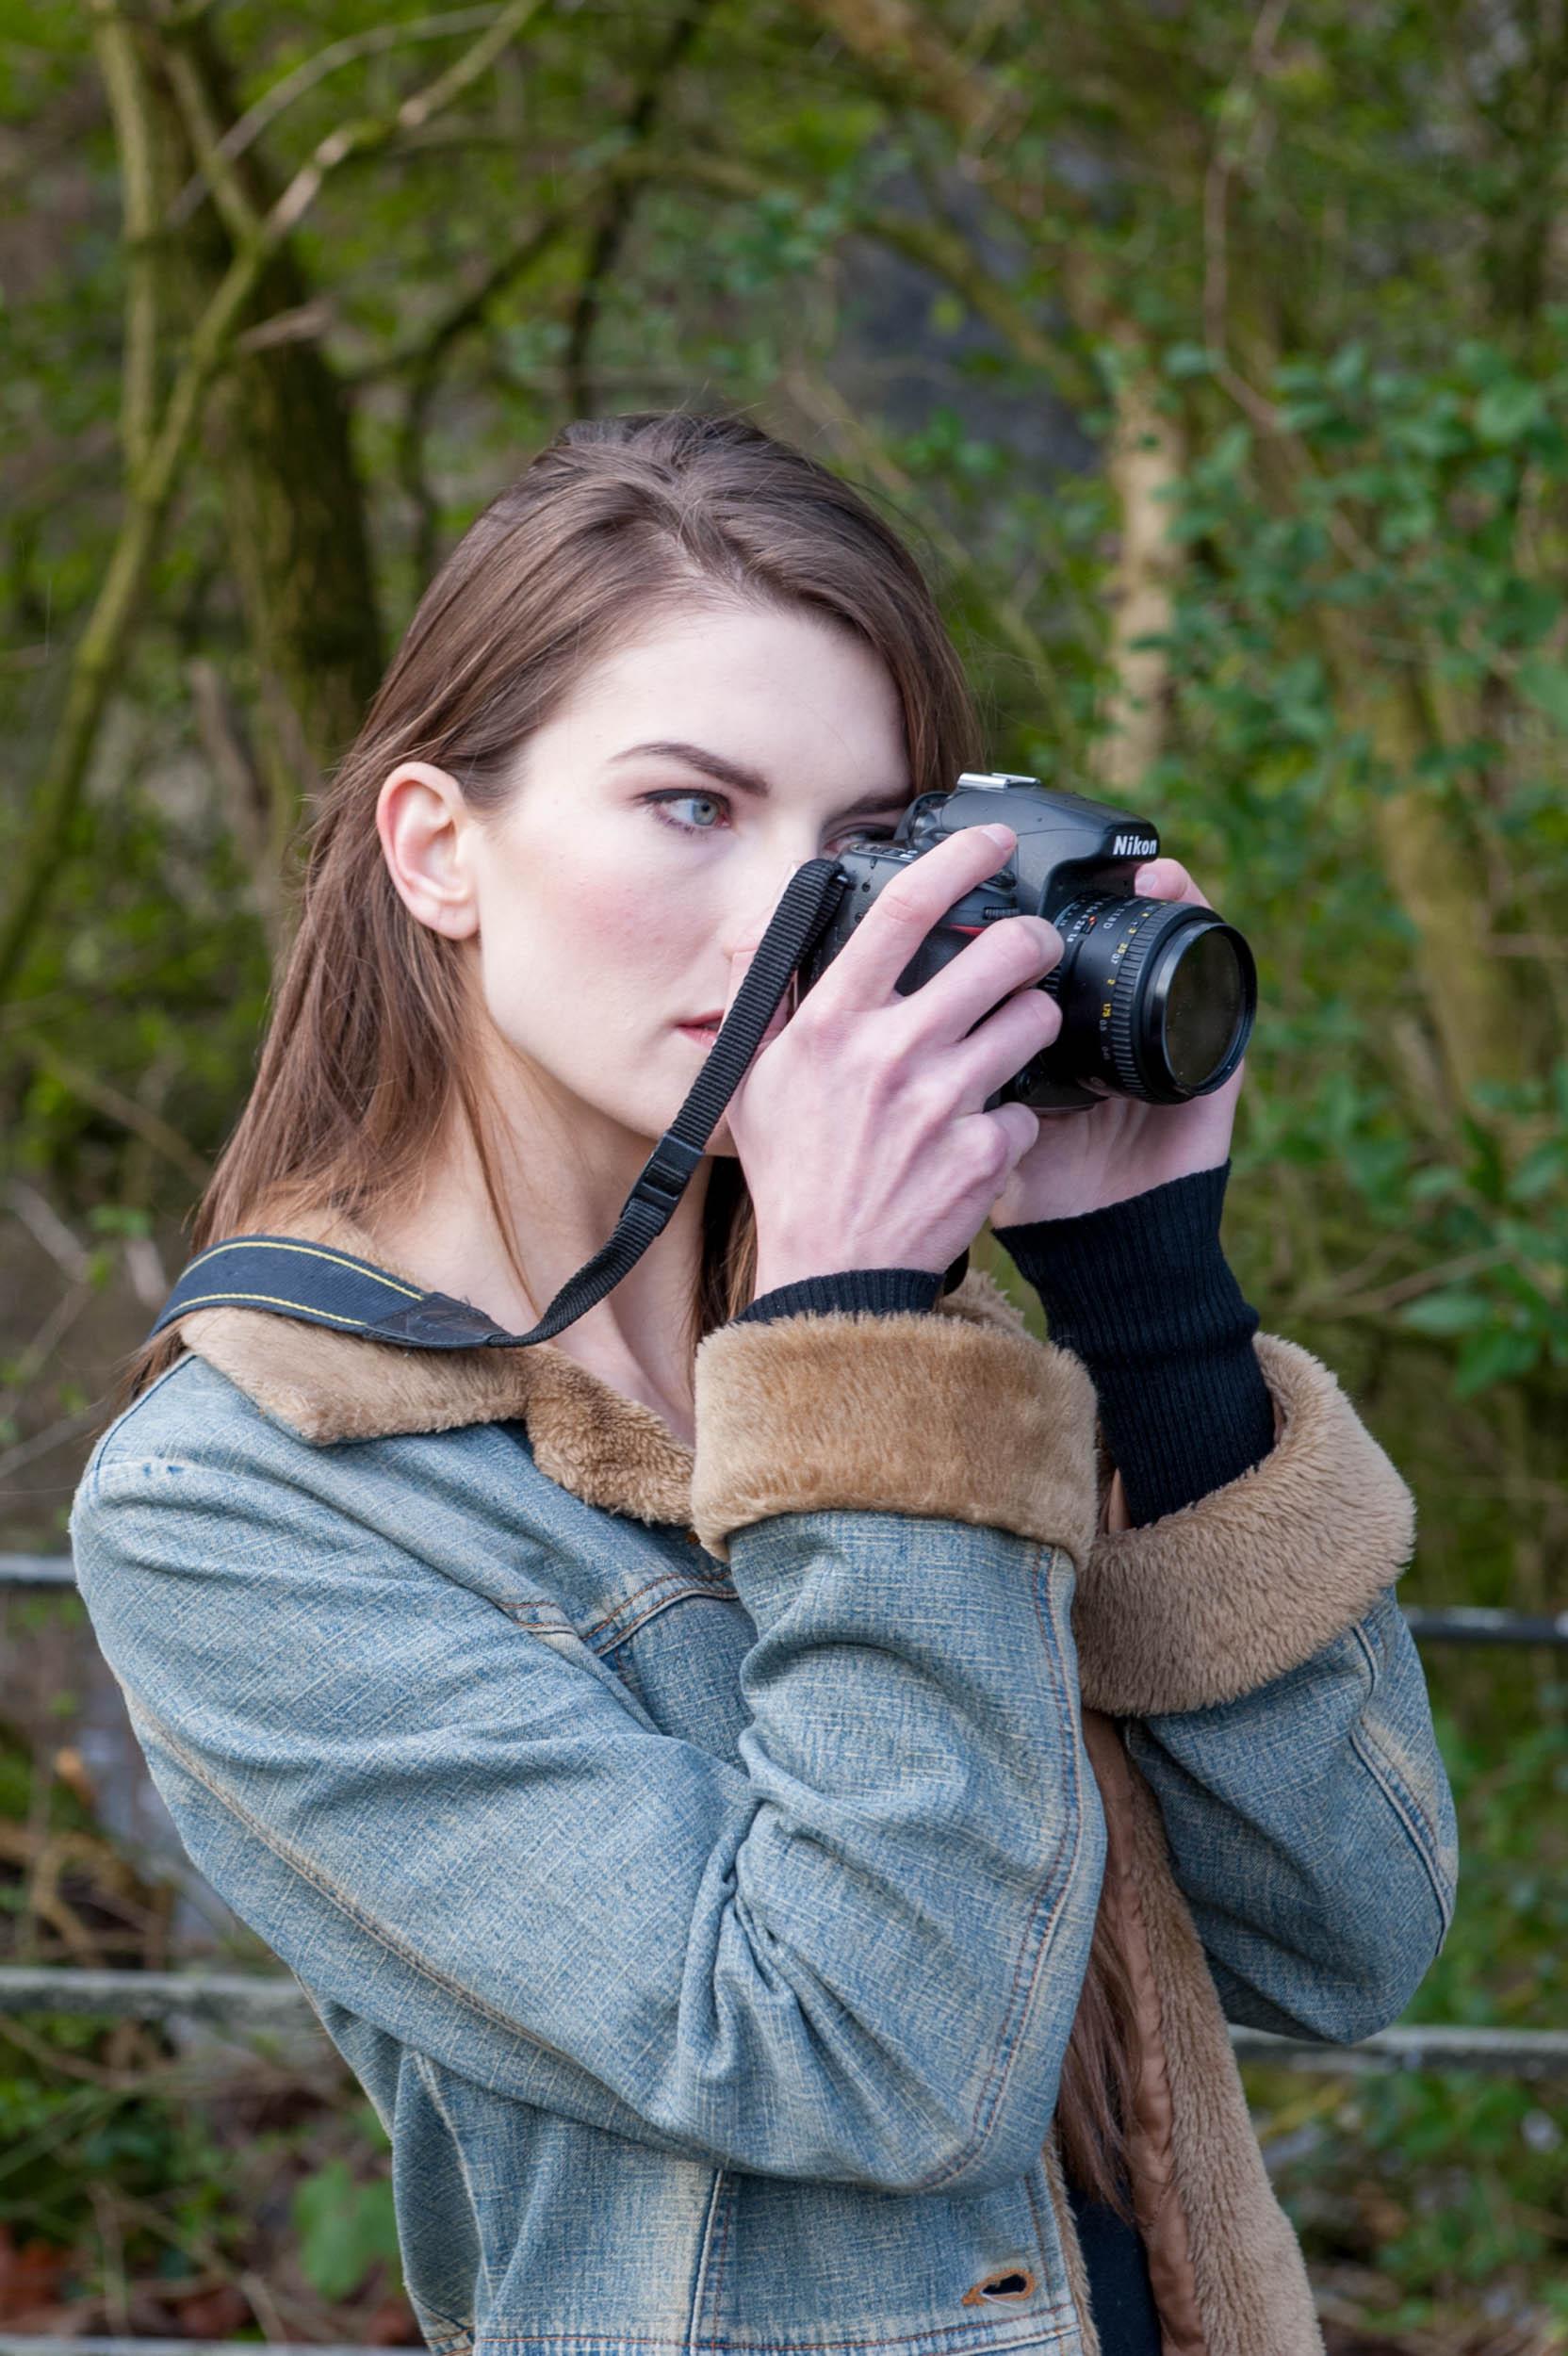 Paul-Saunders-Photography-5612.jpg